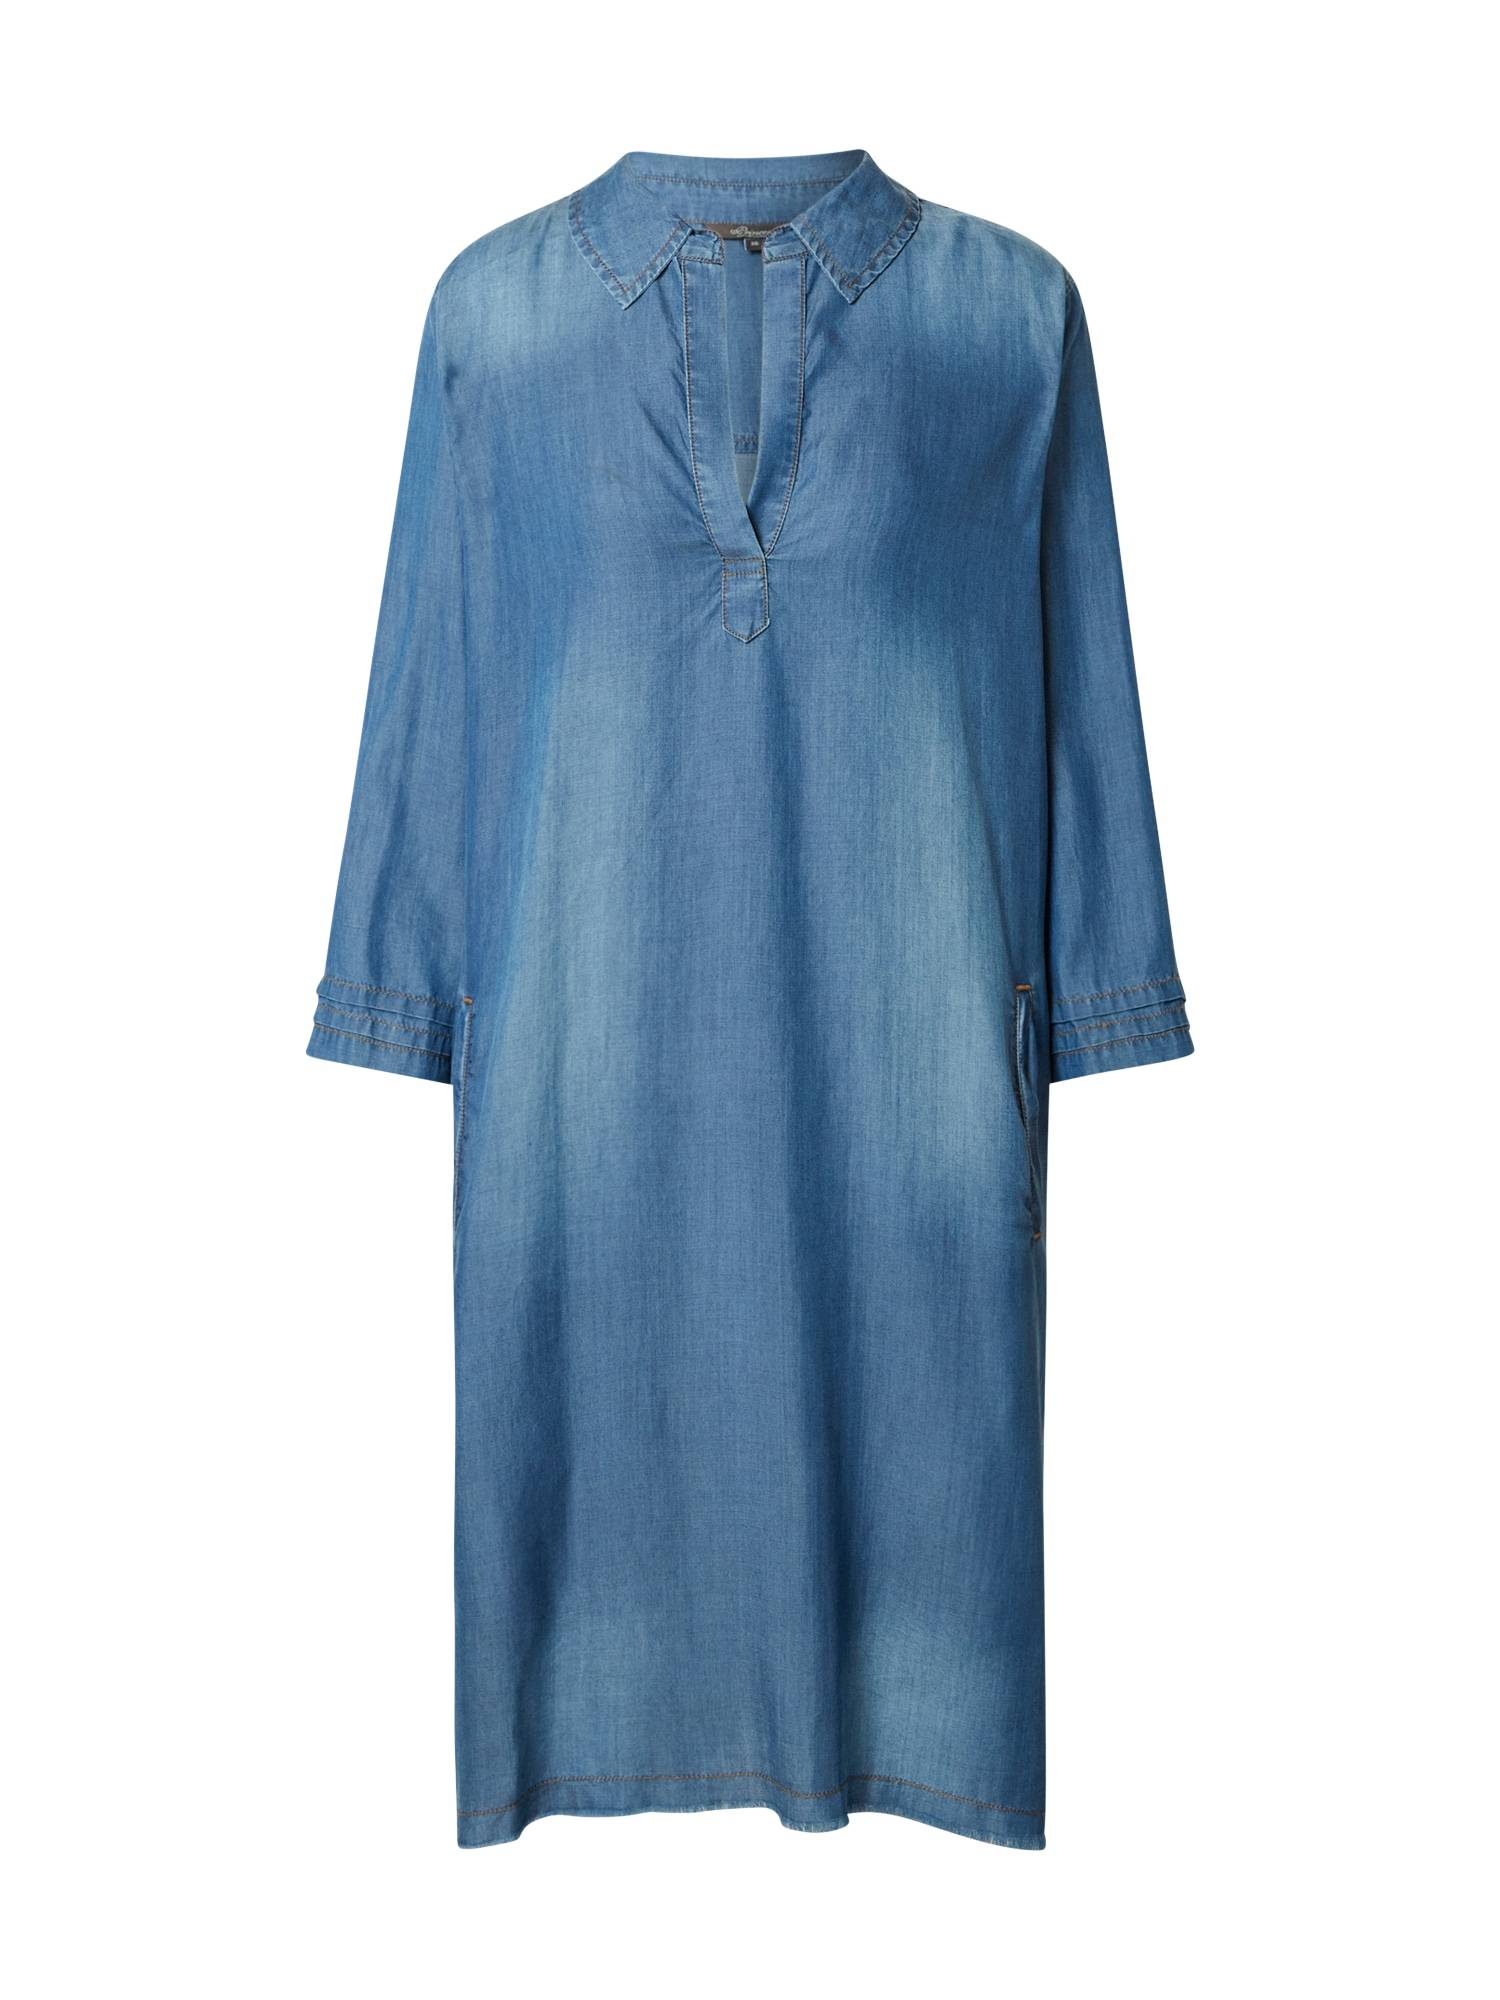 Princess Robe  - Bleu - Taille: 38 - female